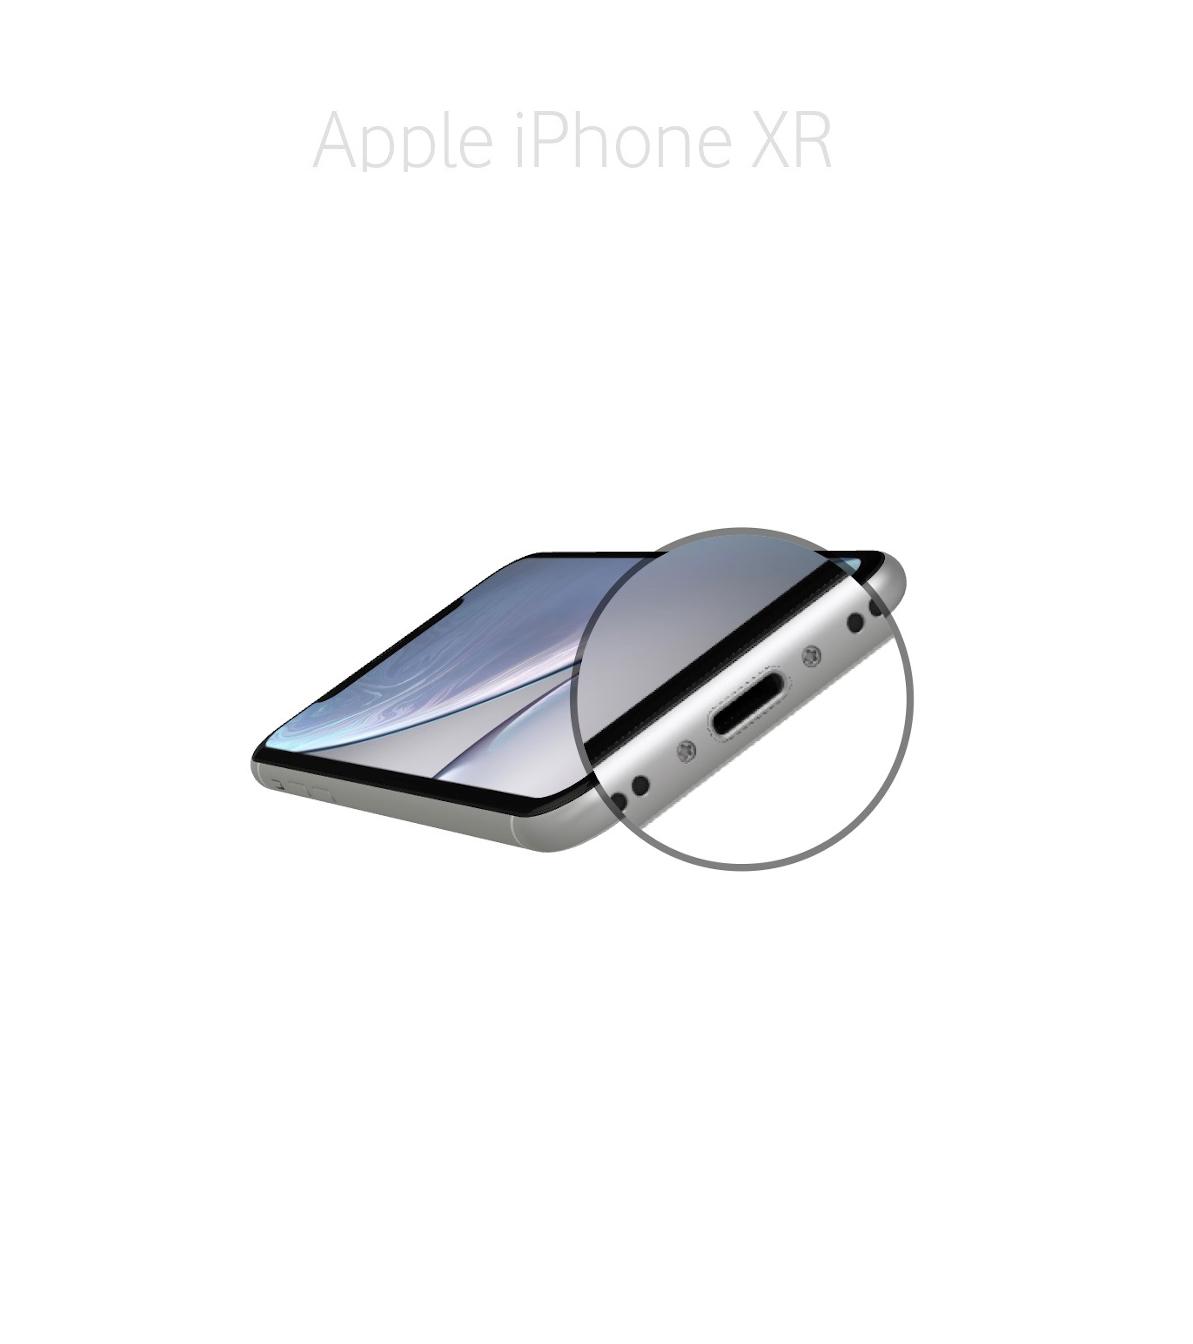 Laga lightningkontakt iPhone XR